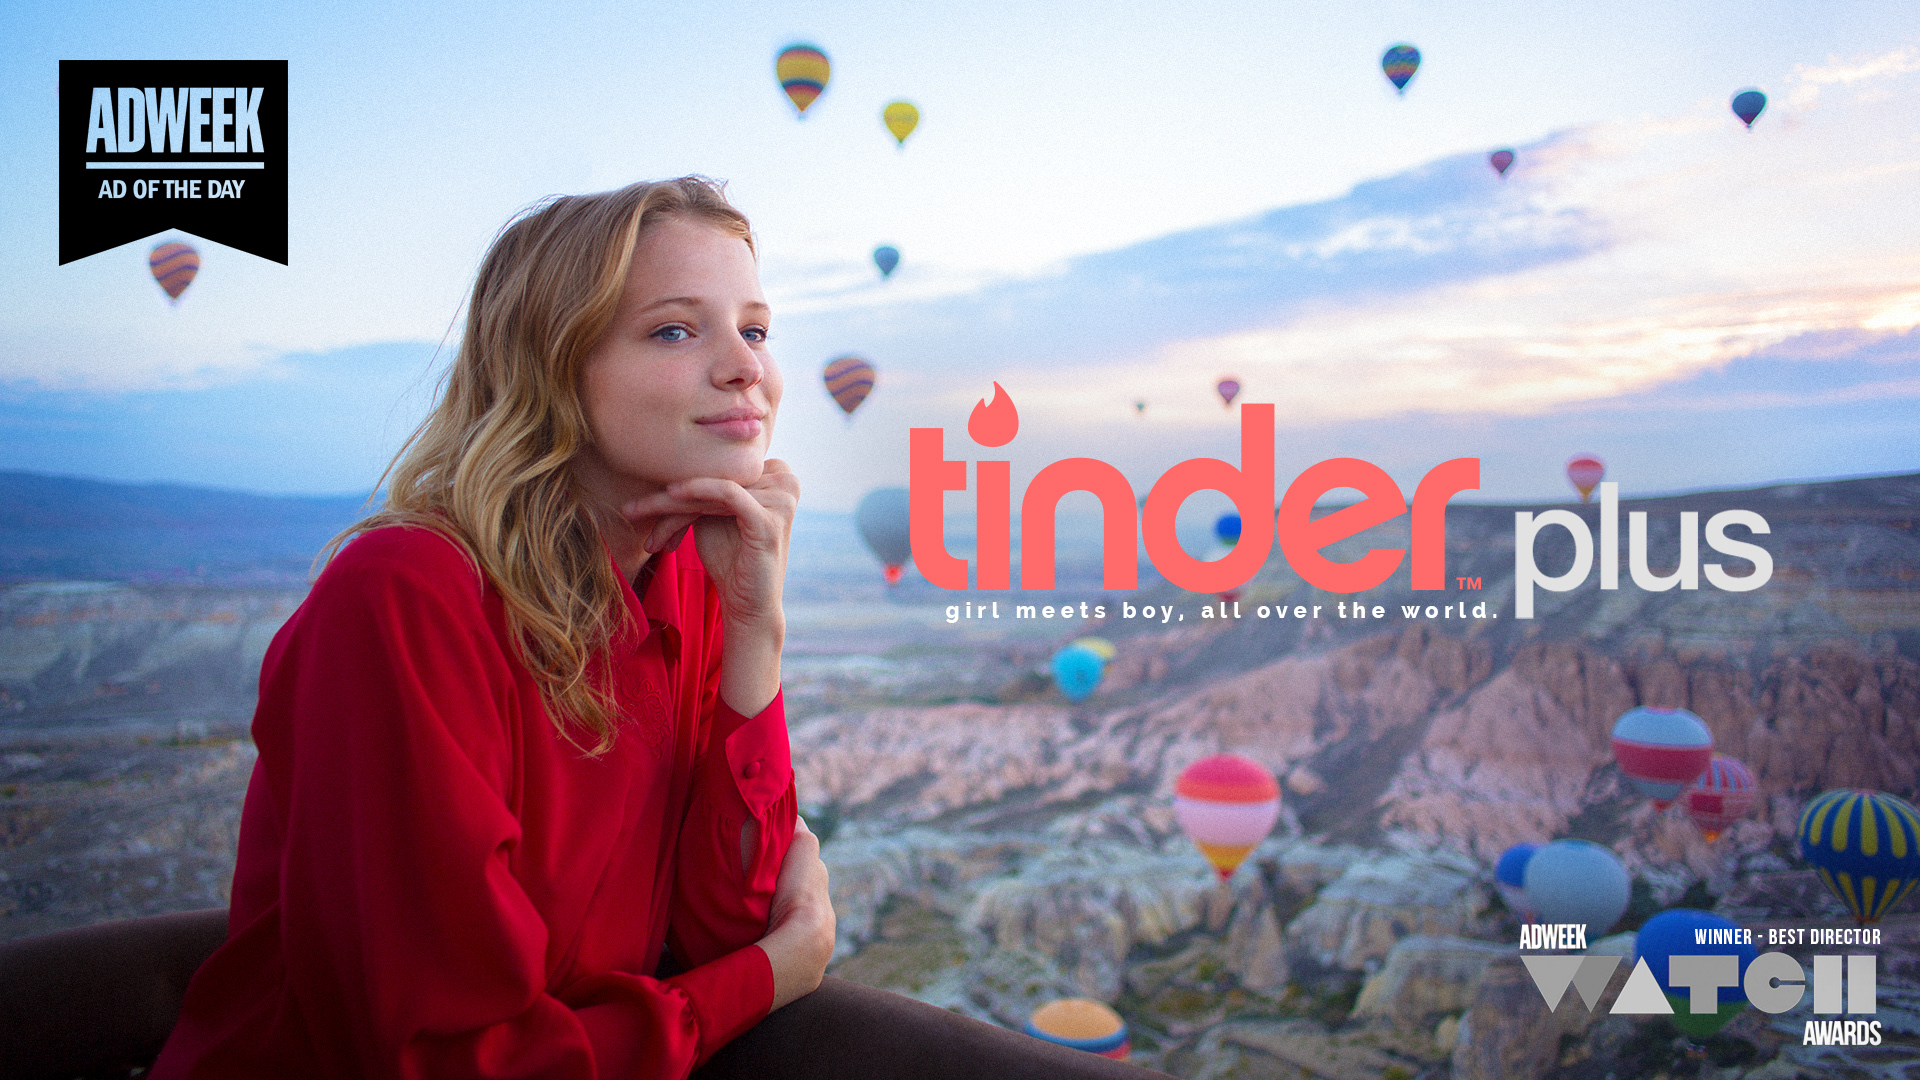 TinderPlus